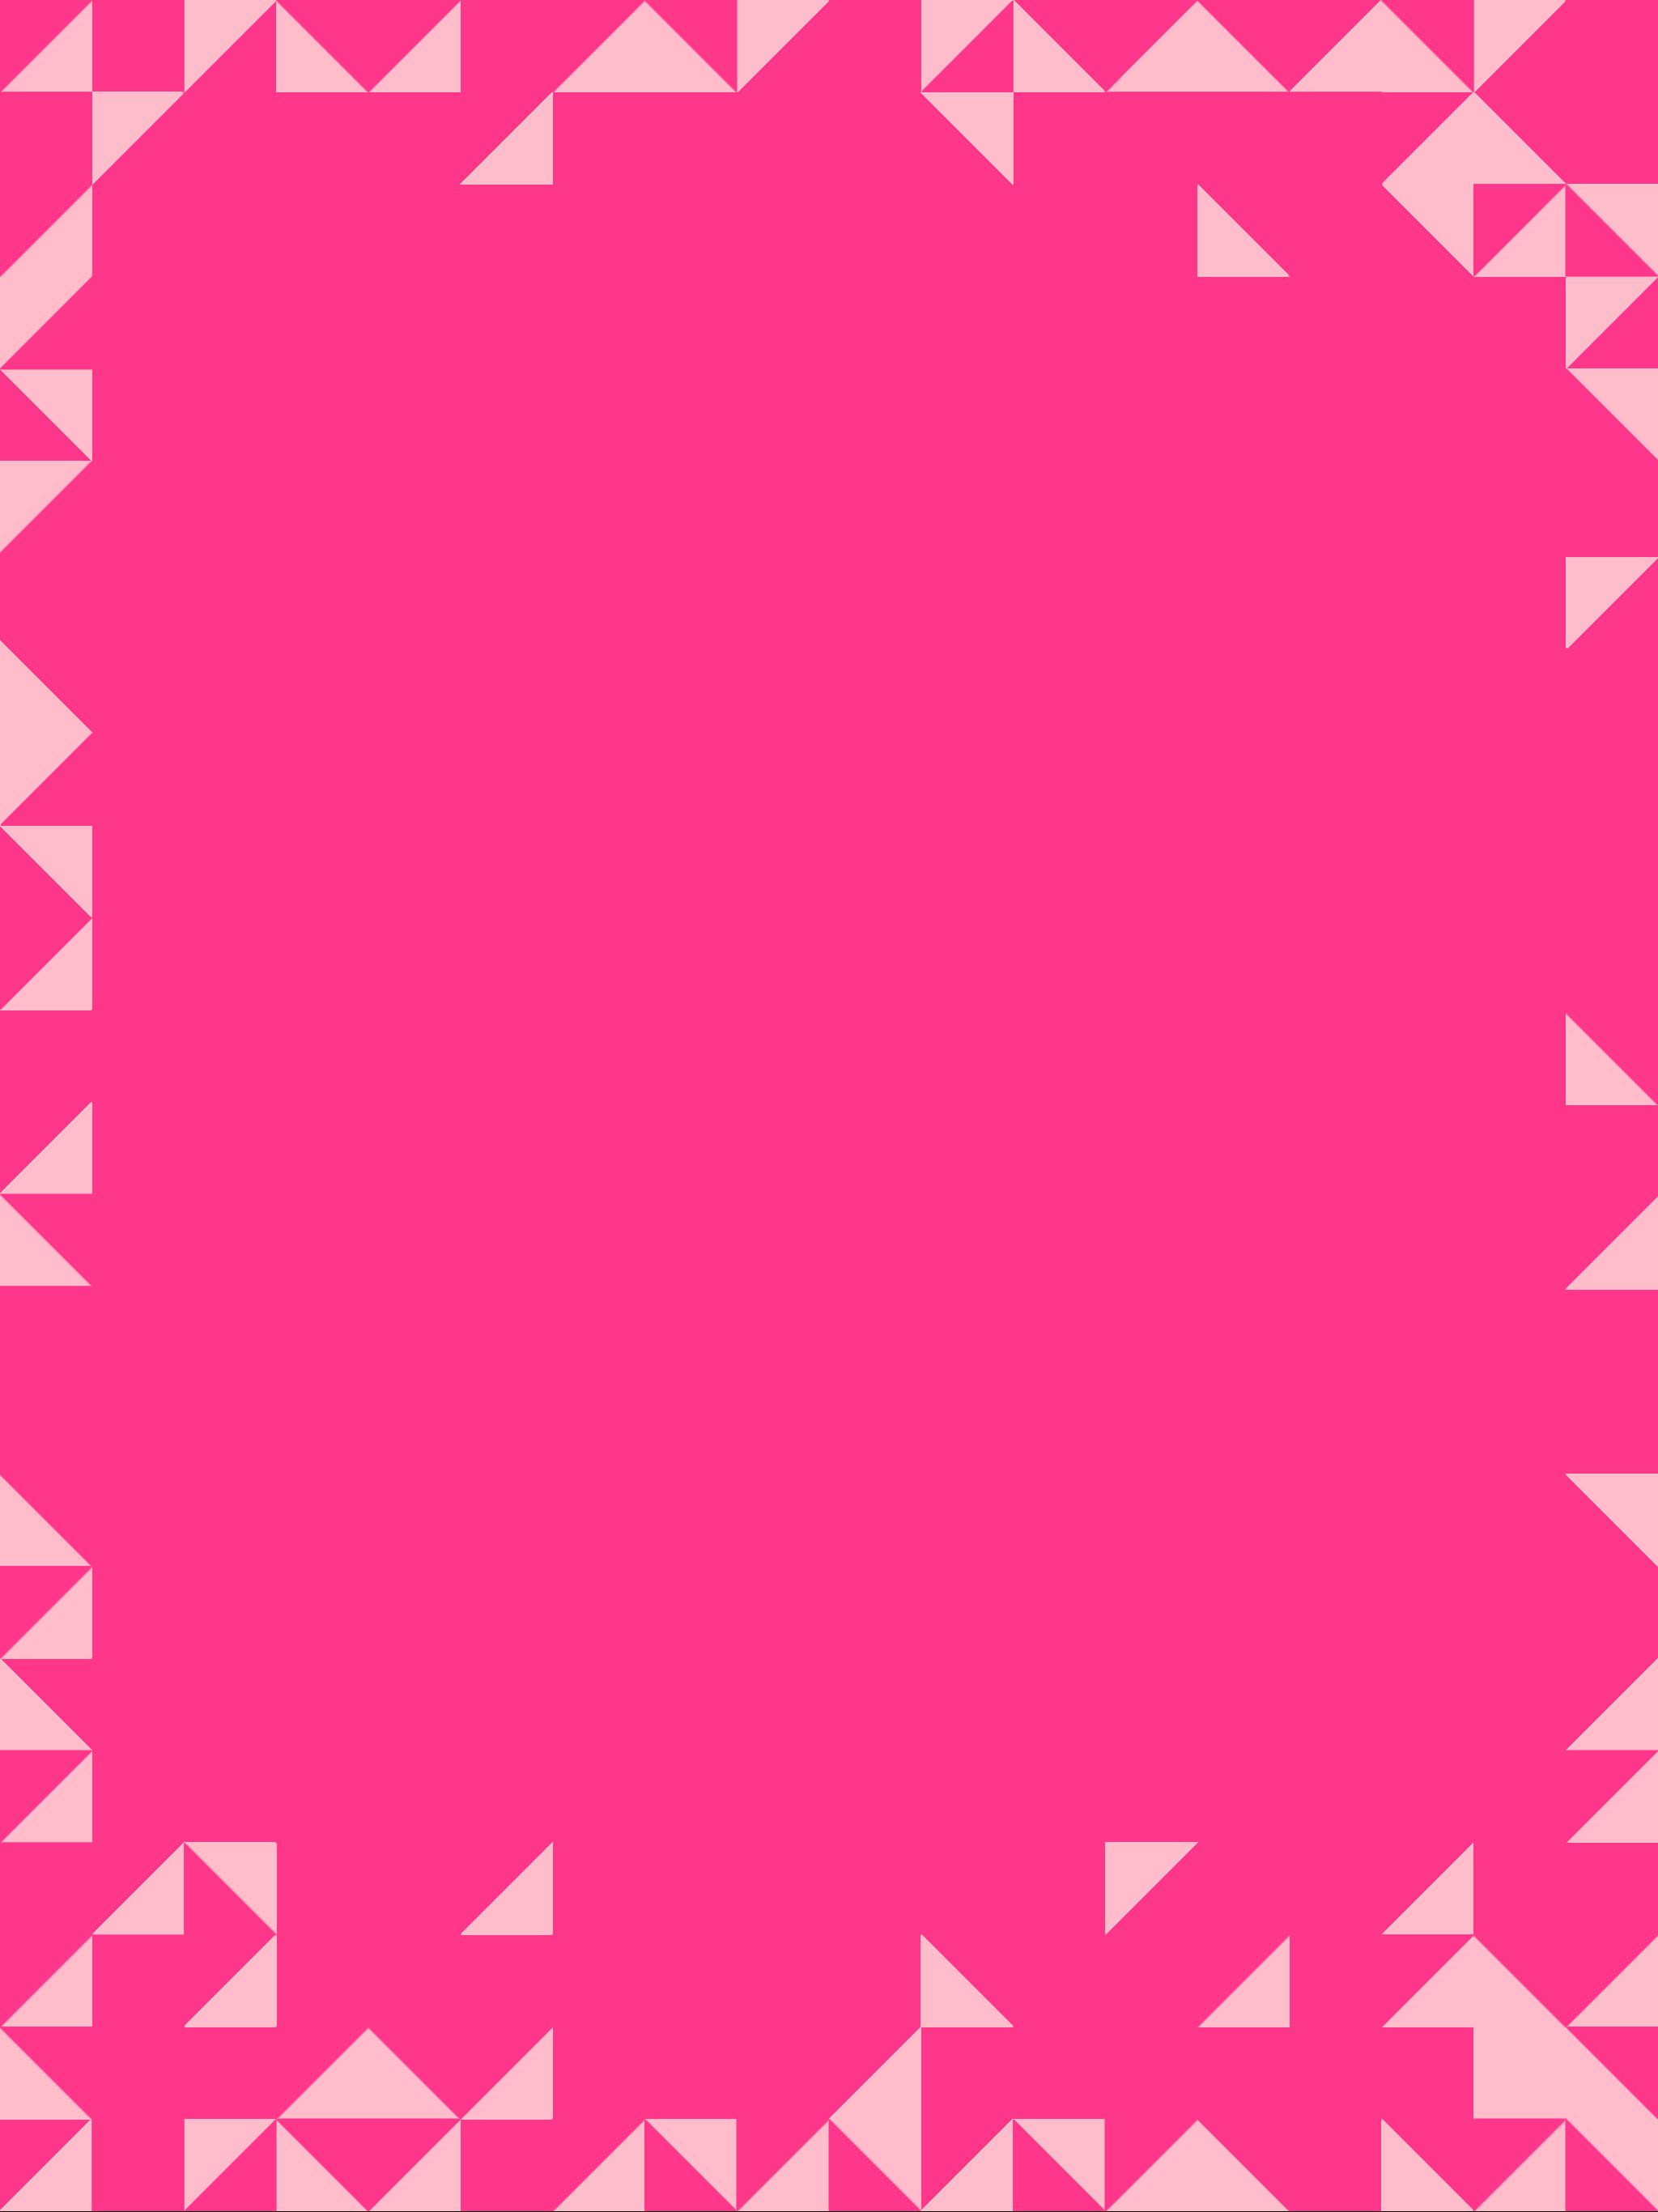 Ipad Vertical_2048x2732_Geo_Pink.png